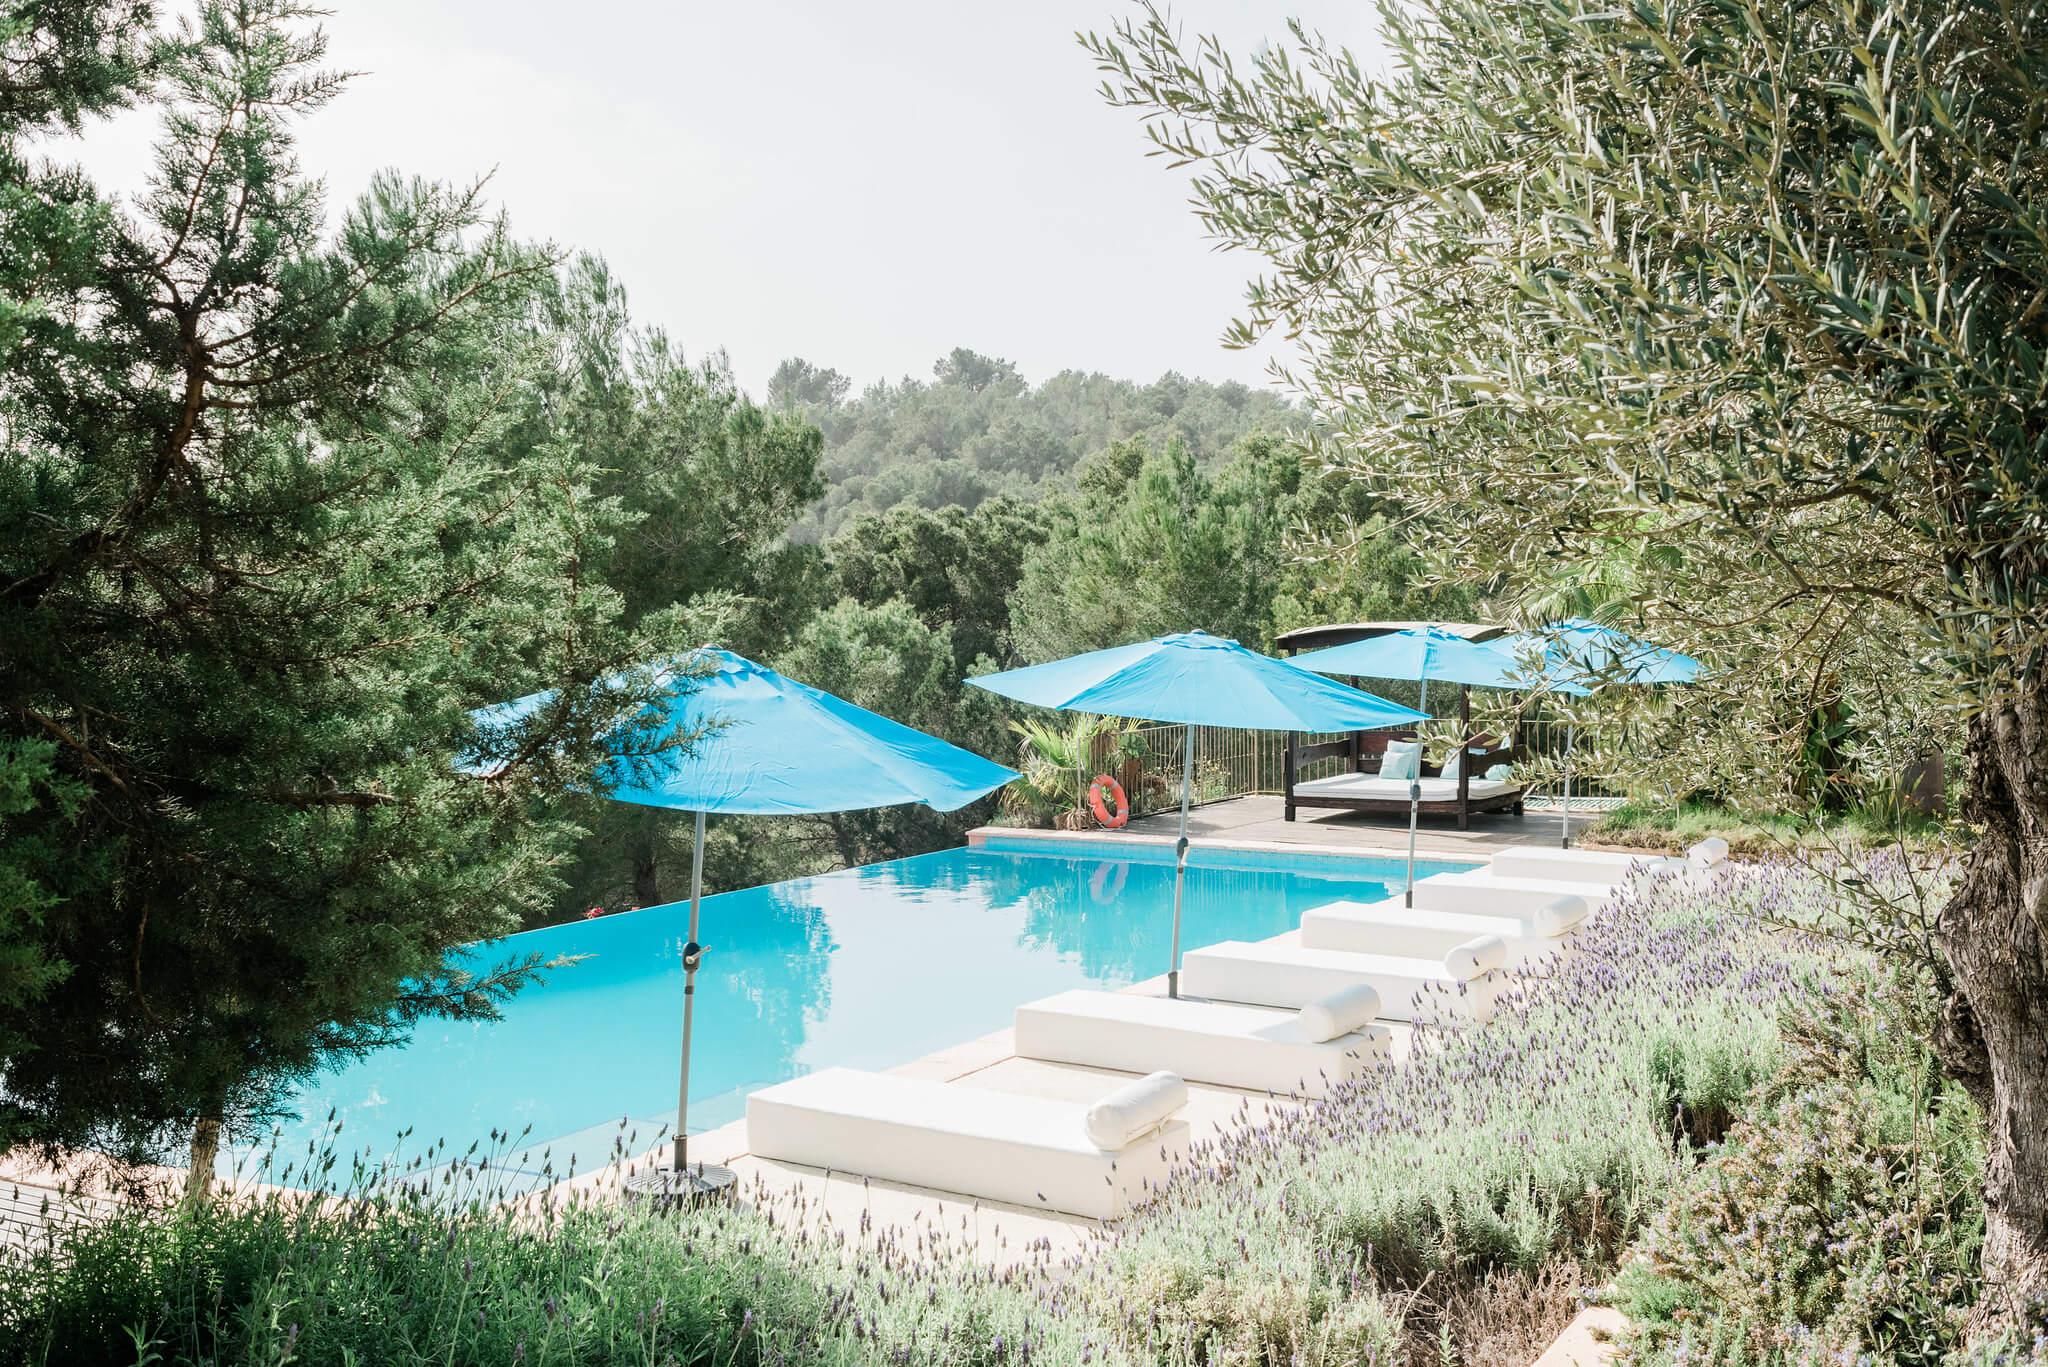 https://www.white-ibiza.com/wp-content/uploads/2020/06/white-ibiza-villas-los-corrales-exterior-pool.jpg